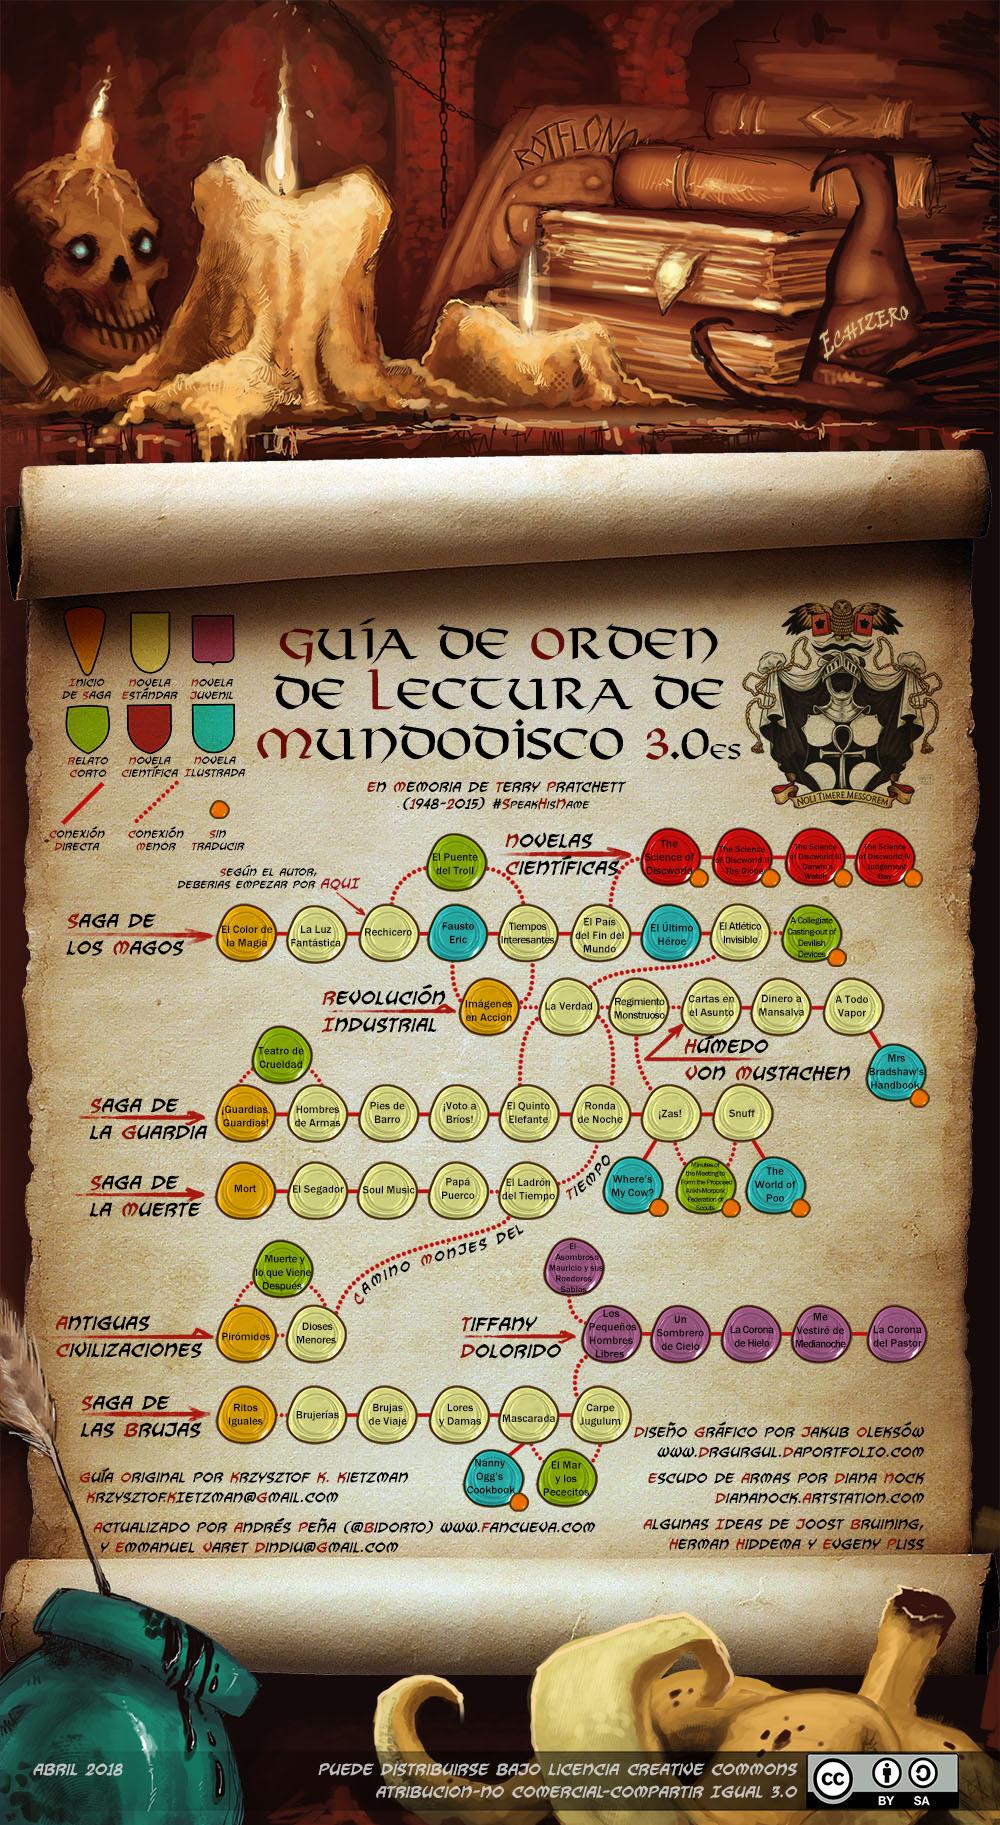 Guia de Orden de Lectura de Mundodisco v3.0es